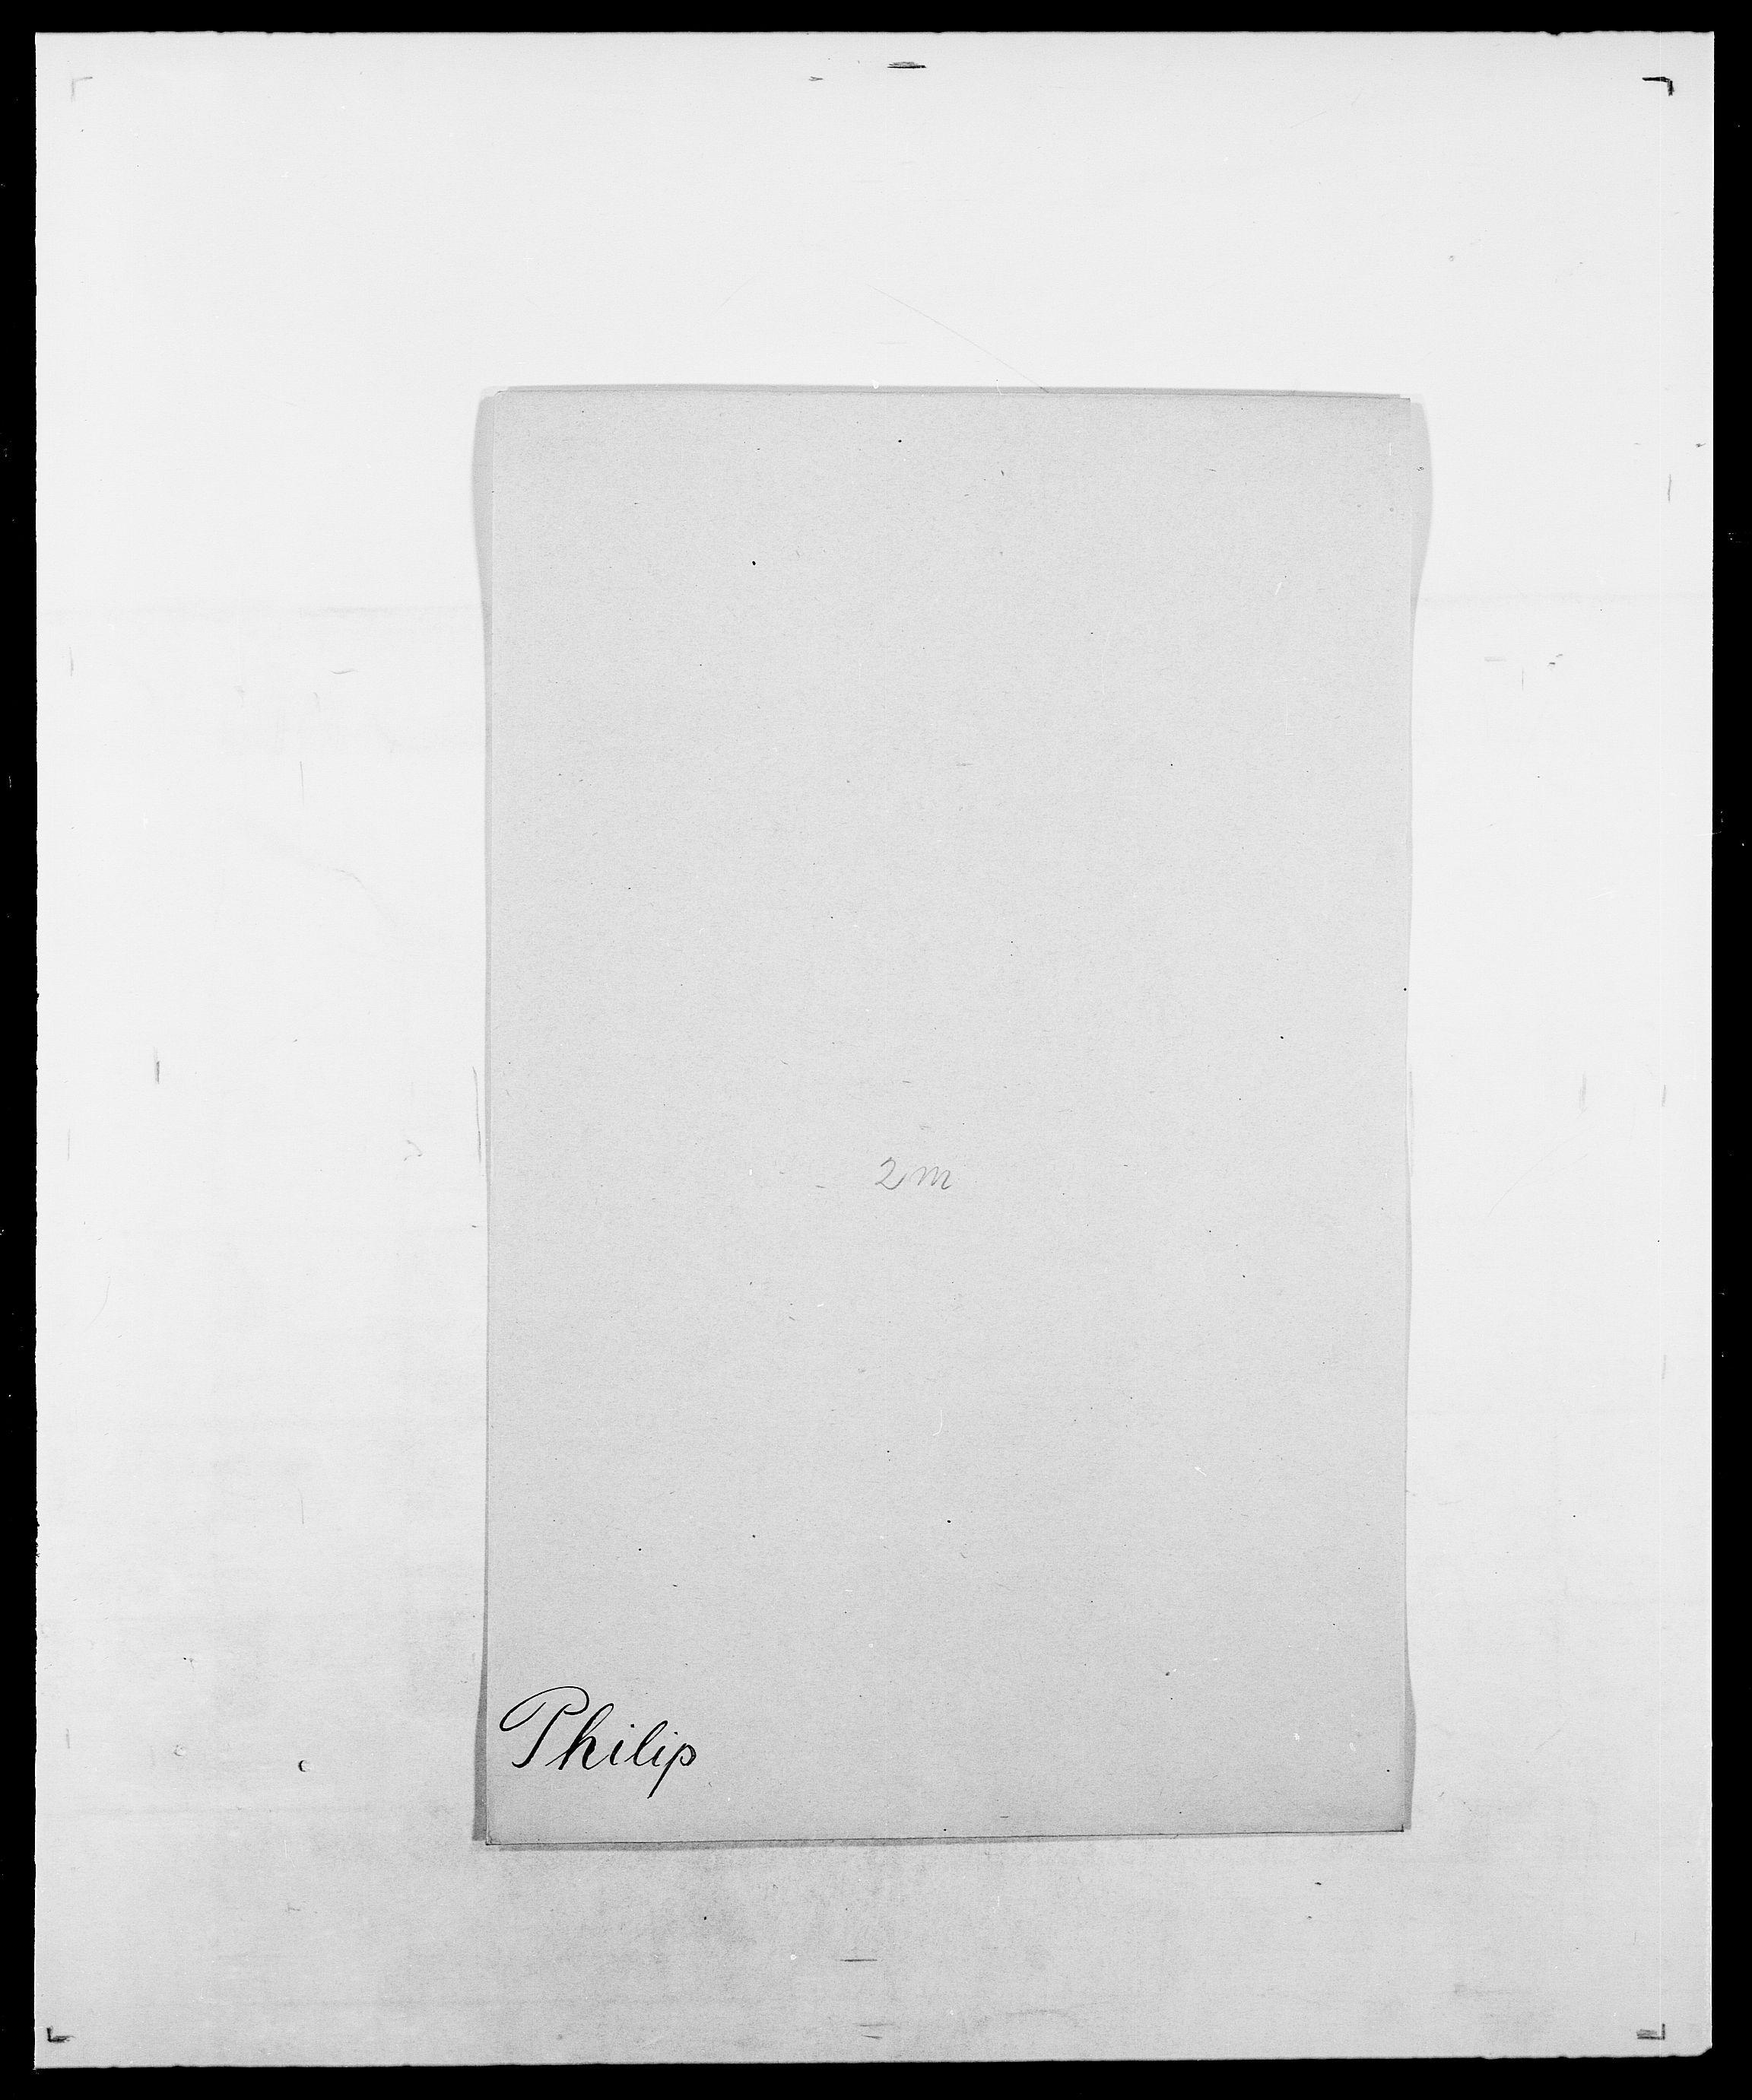 SAO, Delgobe, Charles Antoine - samling, D/Da/L0030: Paars - Pittelkov, s. 516